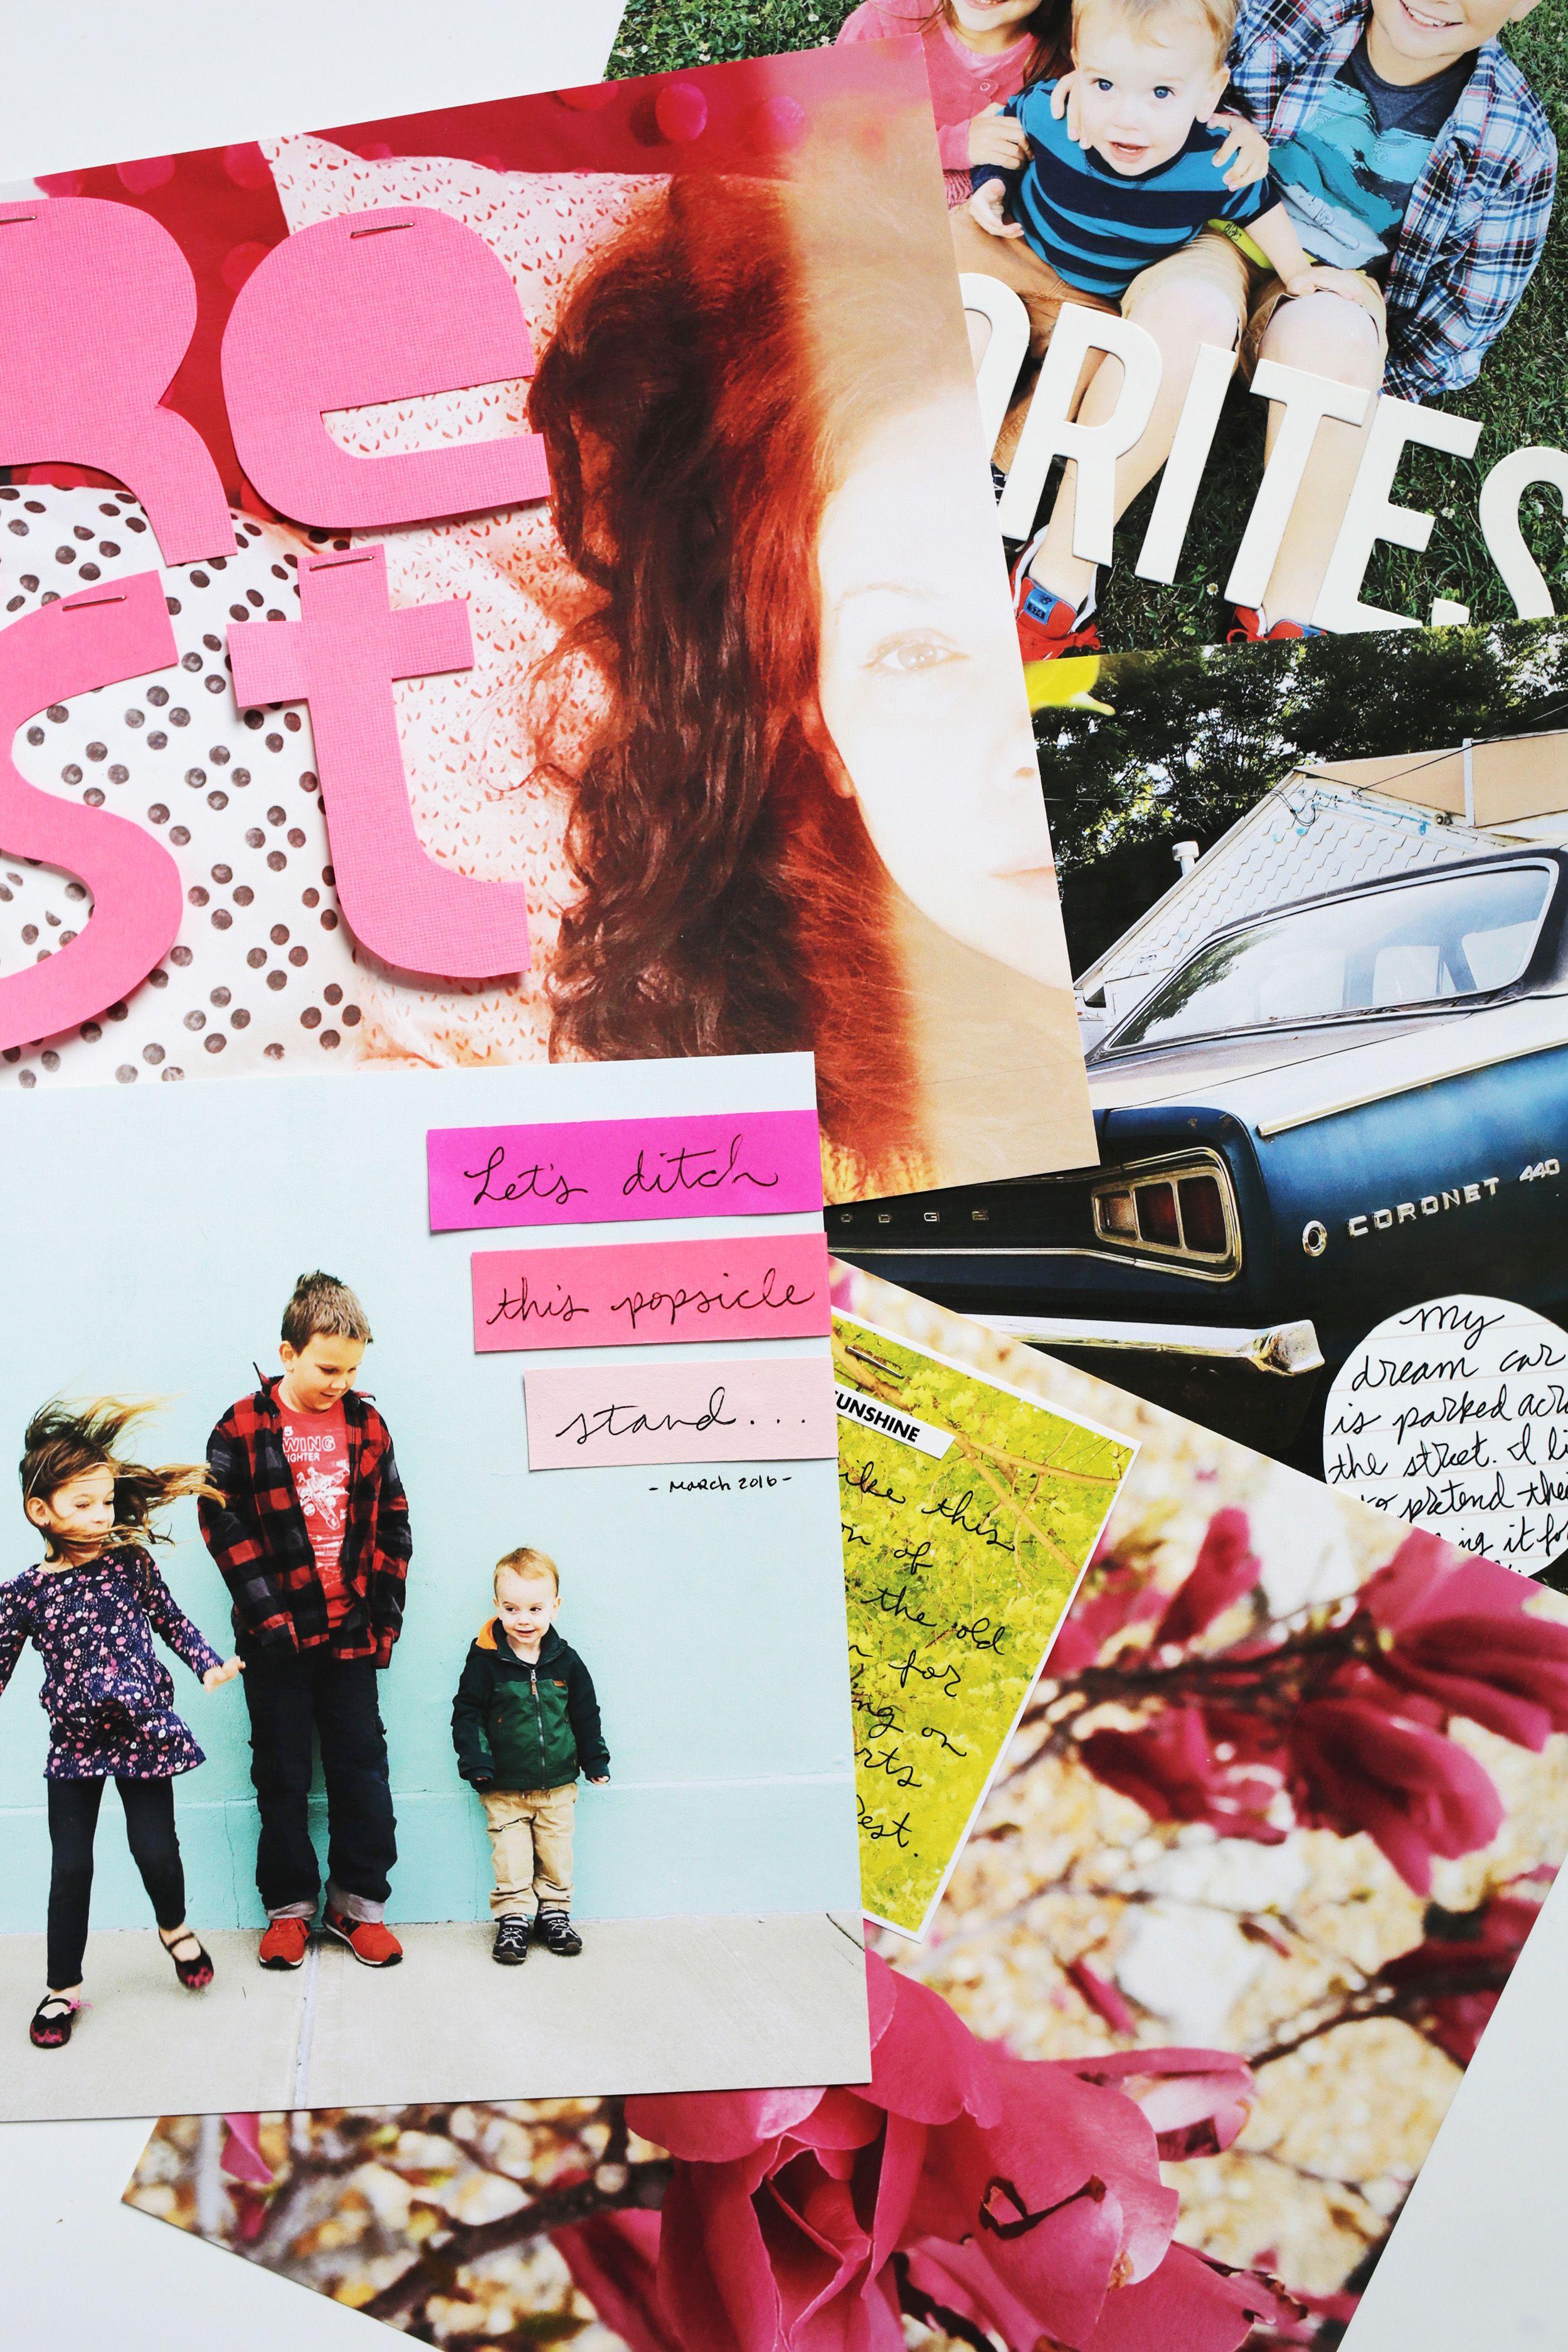 Quick easy scrapbook ideas - 1000 Images About Scrapbooking On Pinterest Diy Scrapbook Scrapbook Designs And Mini Albums